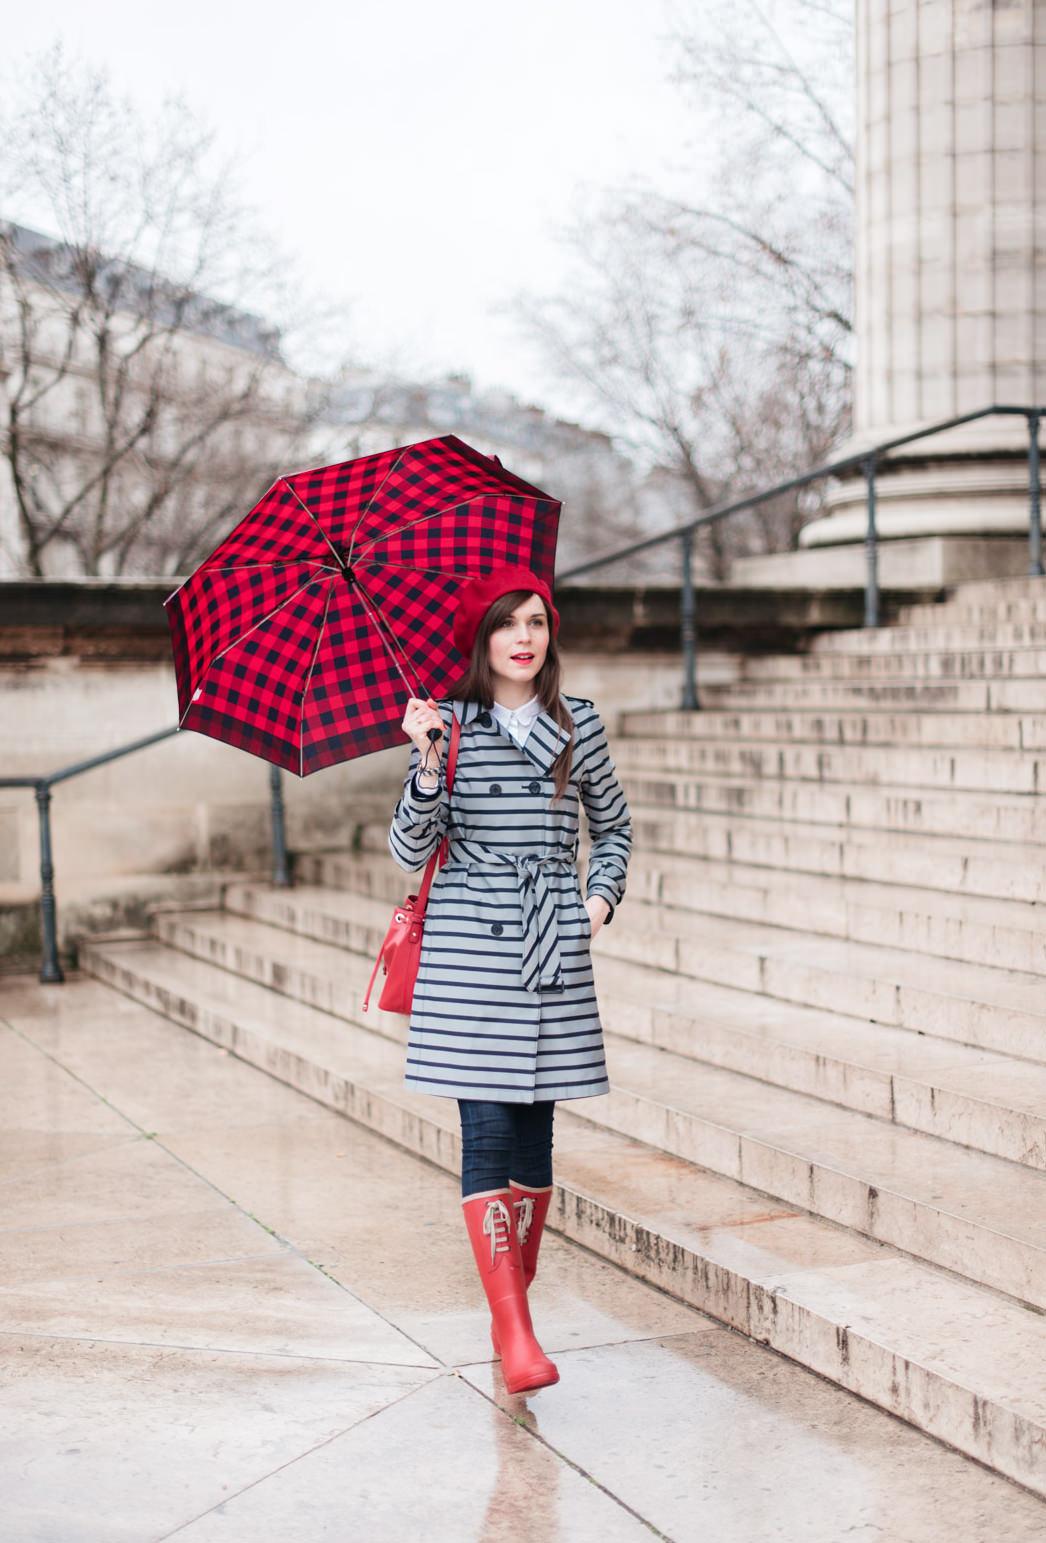 Blog-Mode-And-The-City-Looks-Comment-S-Habiller-quand-il-pleut-8